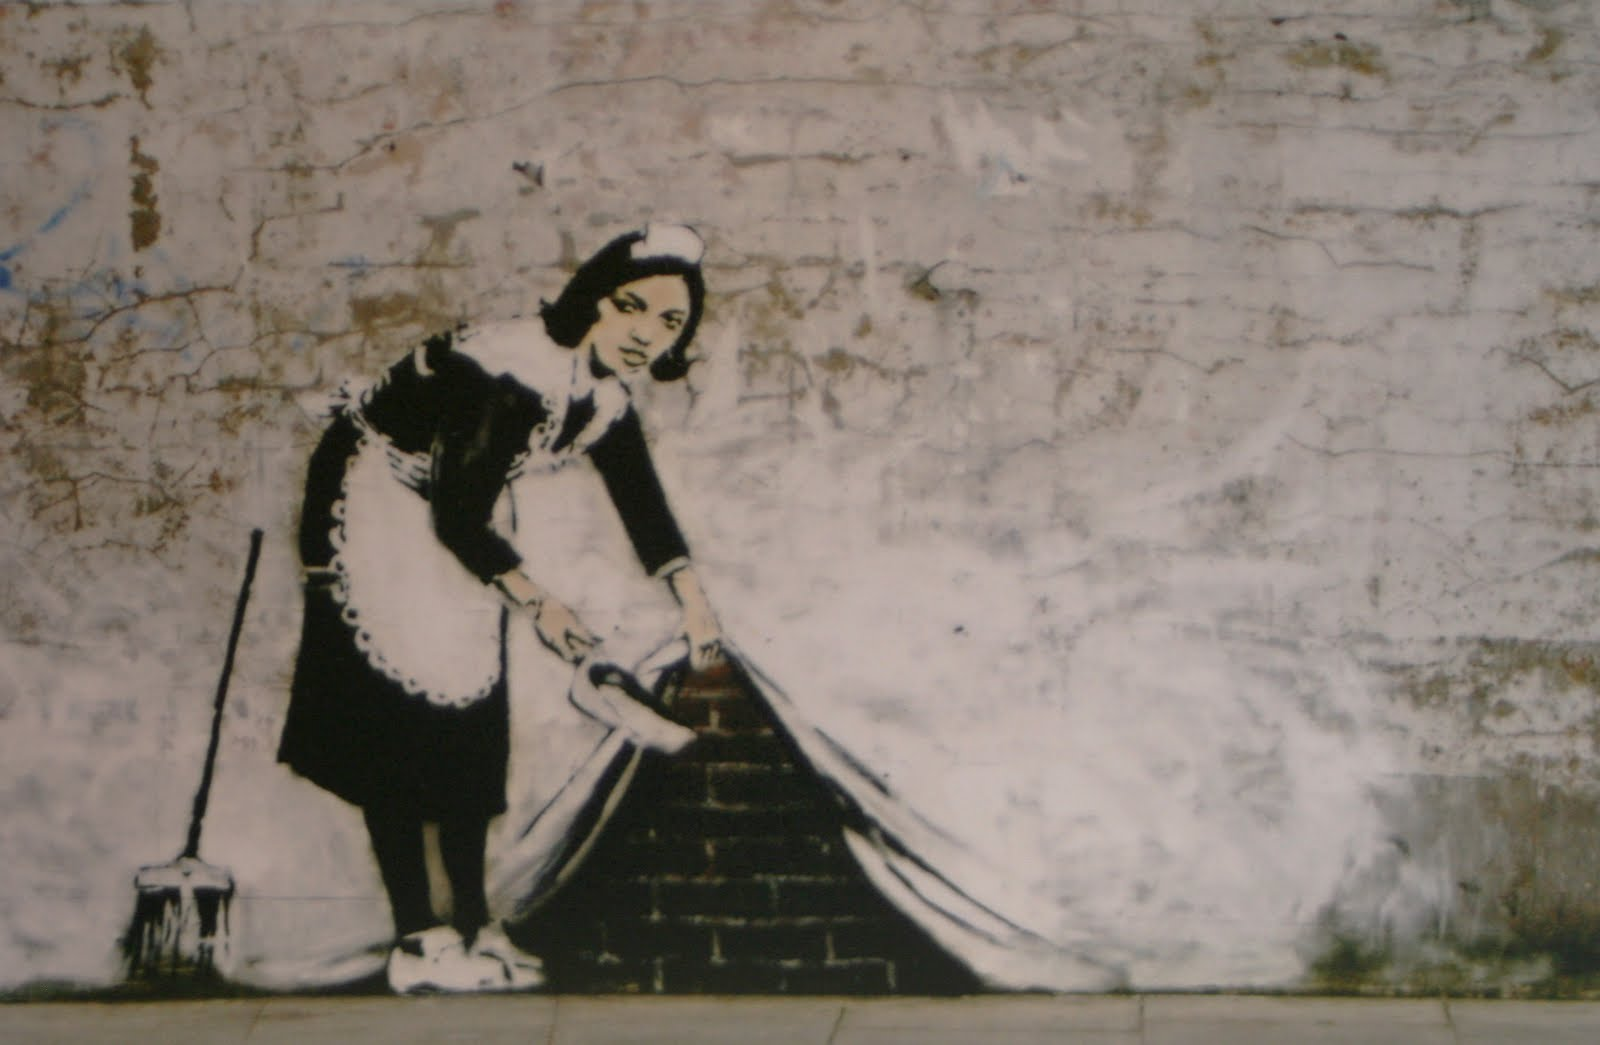 City Art Gallery Graffiti Artists